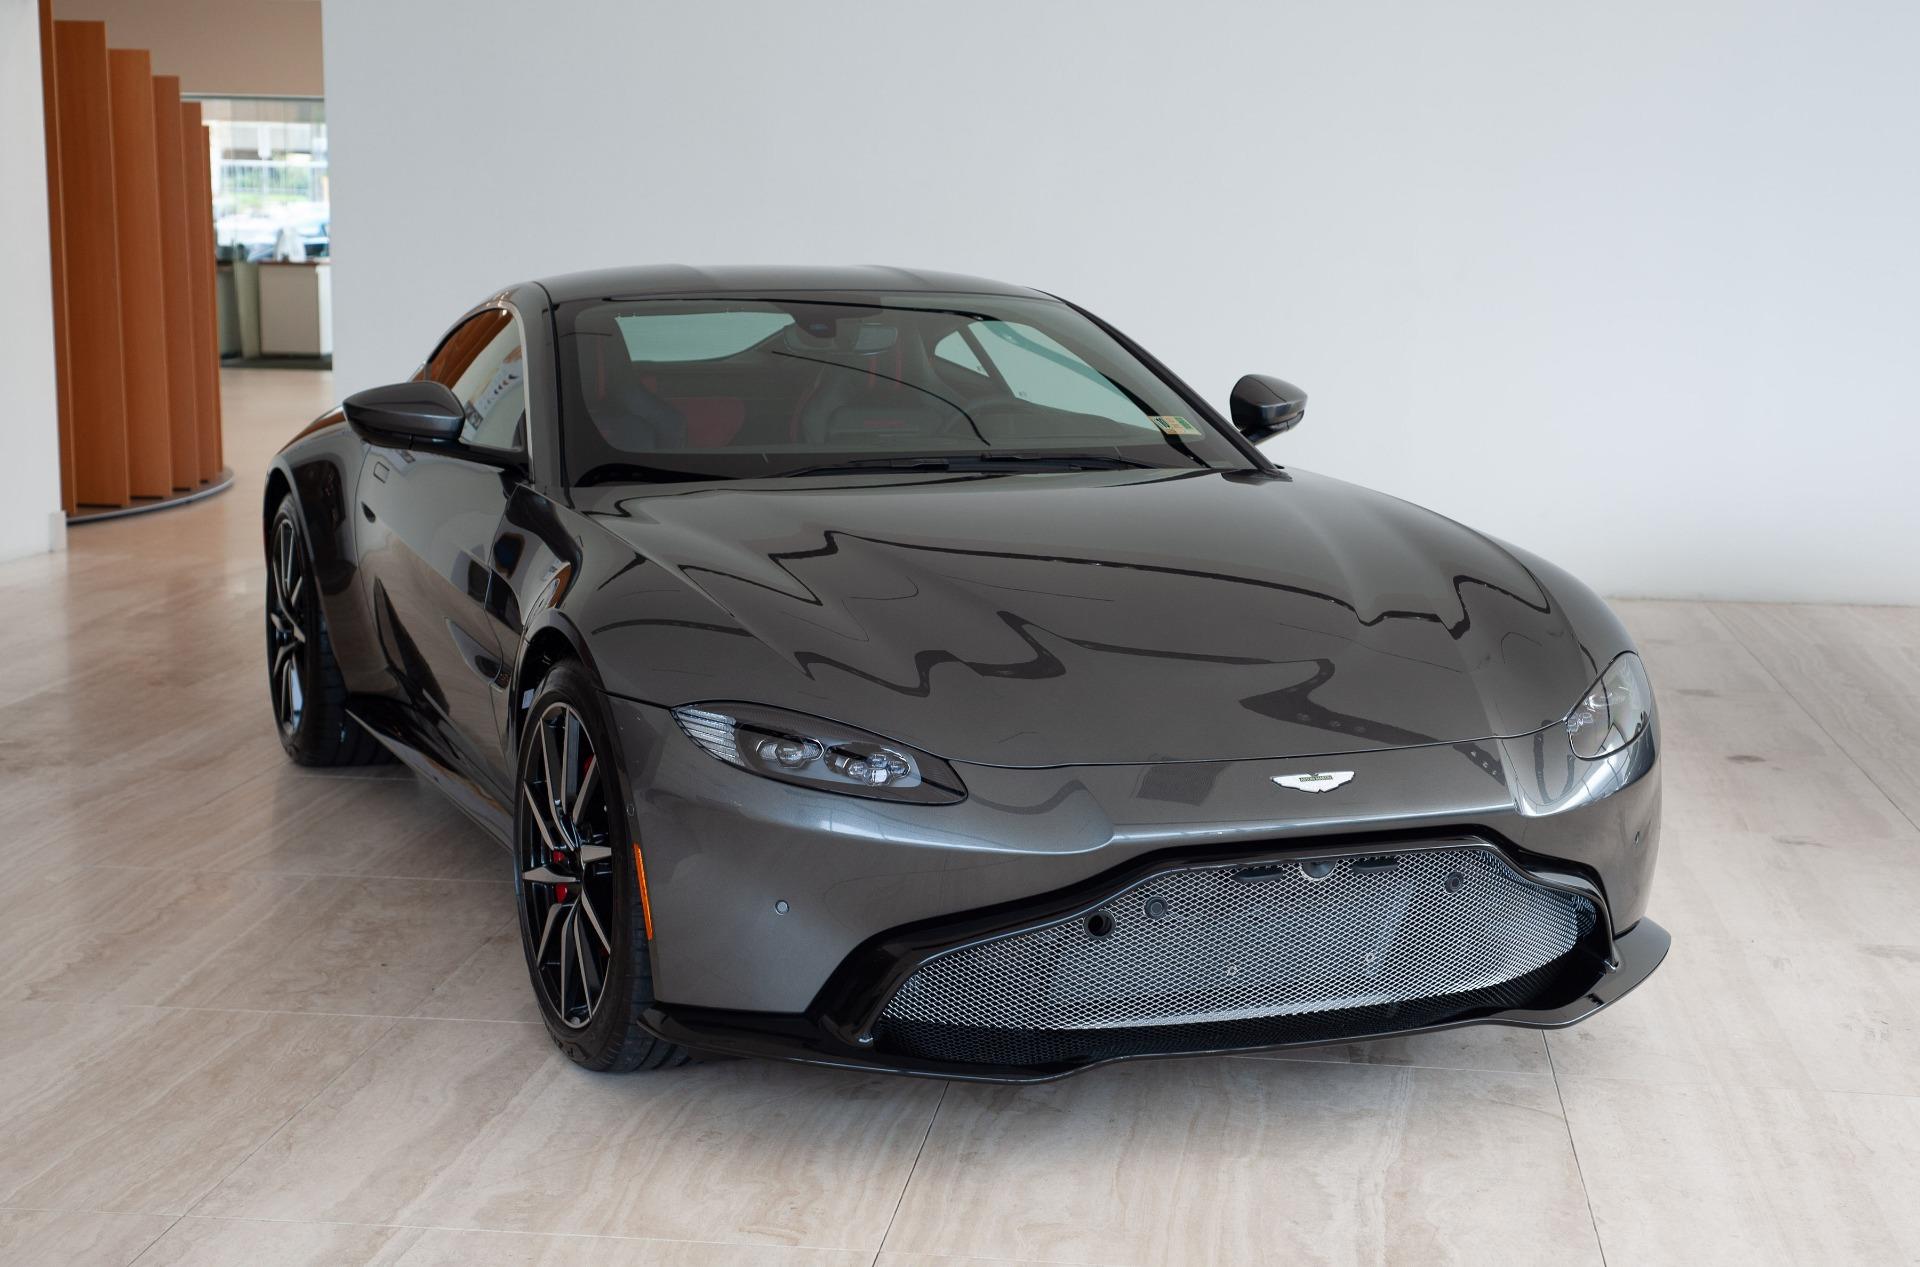 Www Exclusiveautomotivegroup Com Galleria Images 1